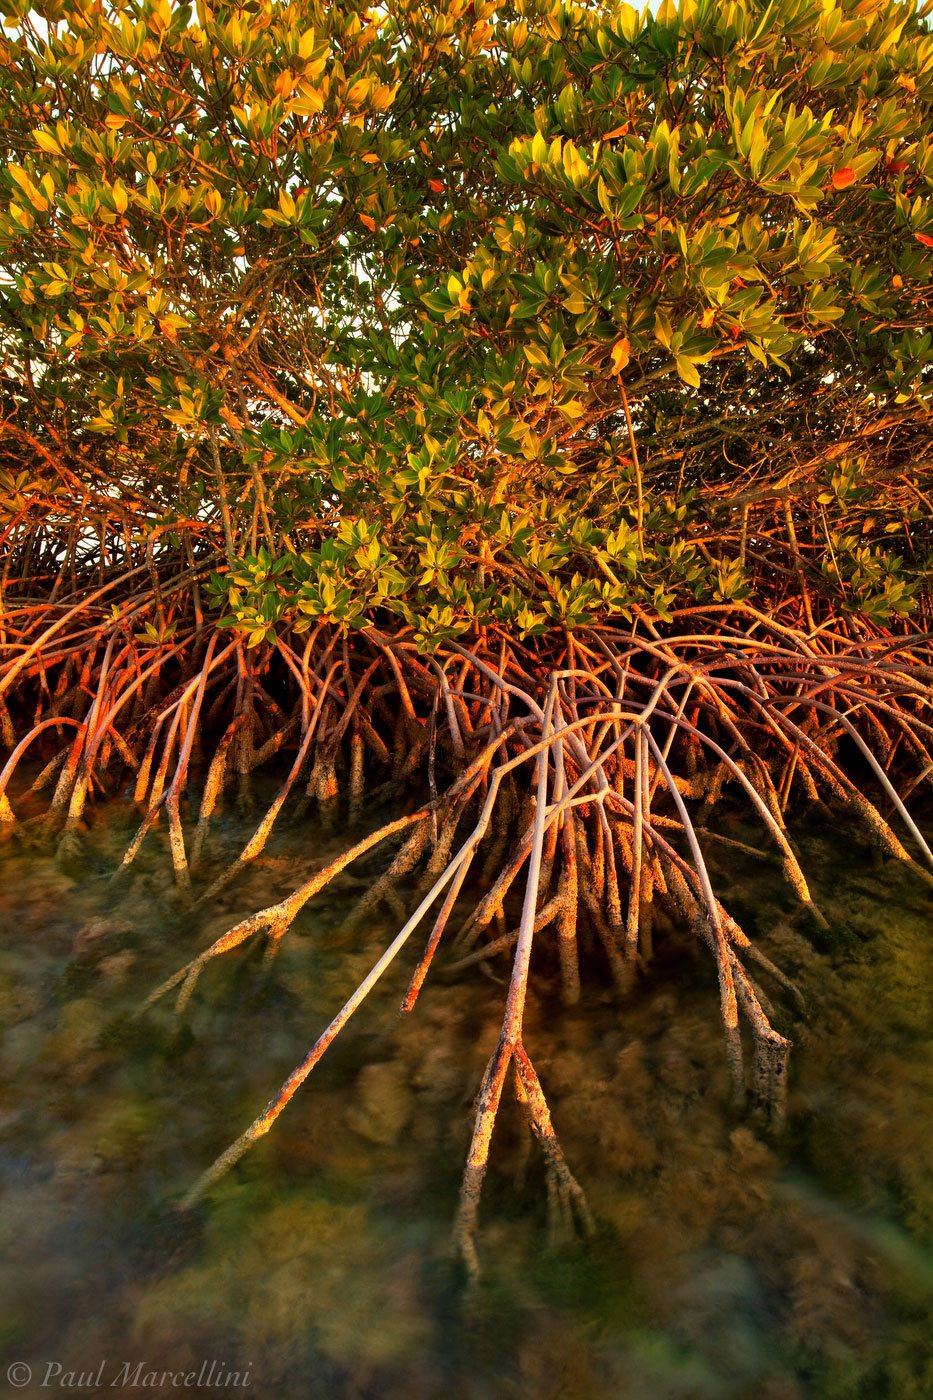 red mangrove, rhizophora mangle, prop roots, keys, florida, florida keys, south florida, nature, photography, , photo